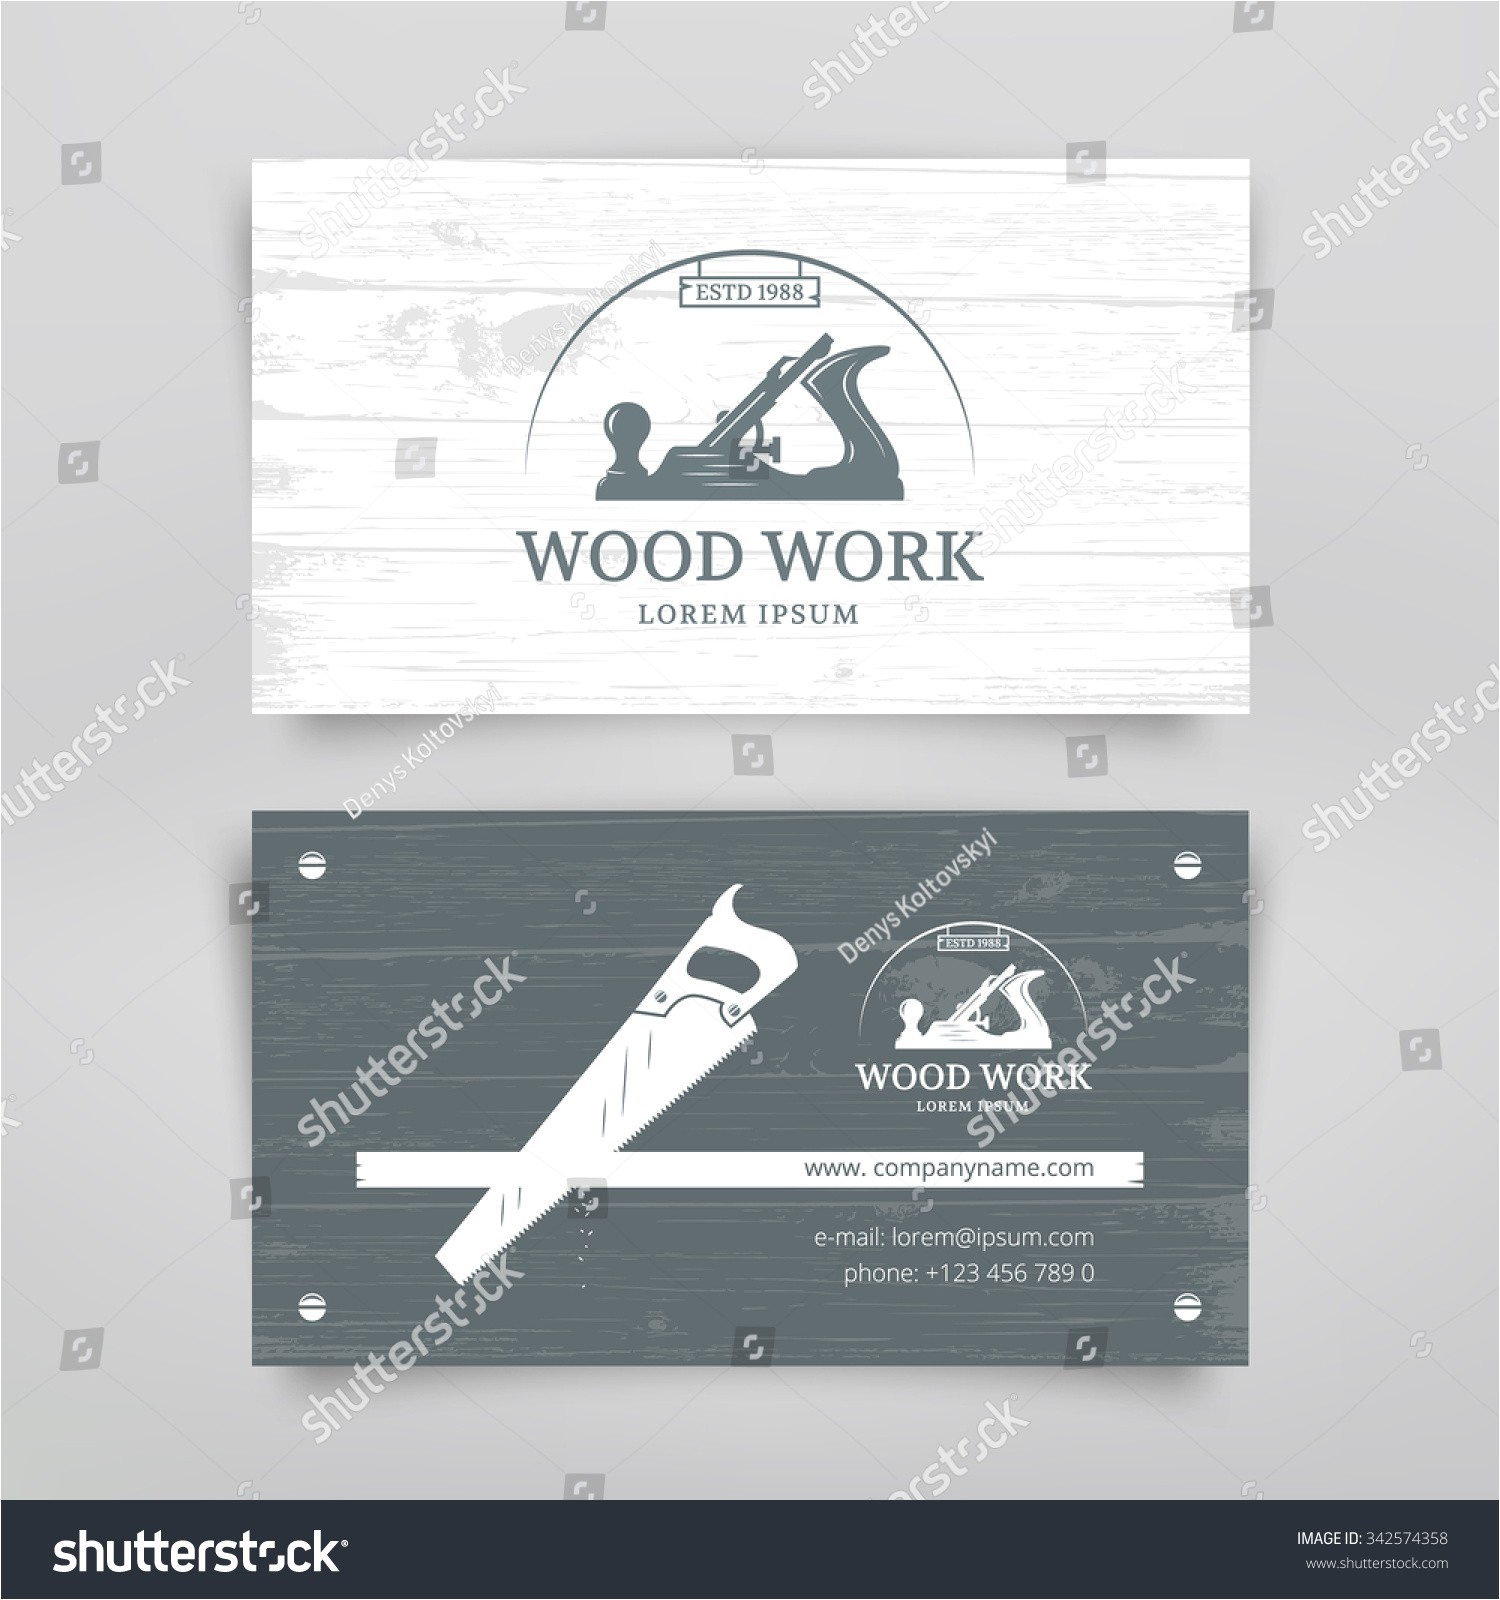 woodwork vintage style business card design 342574358